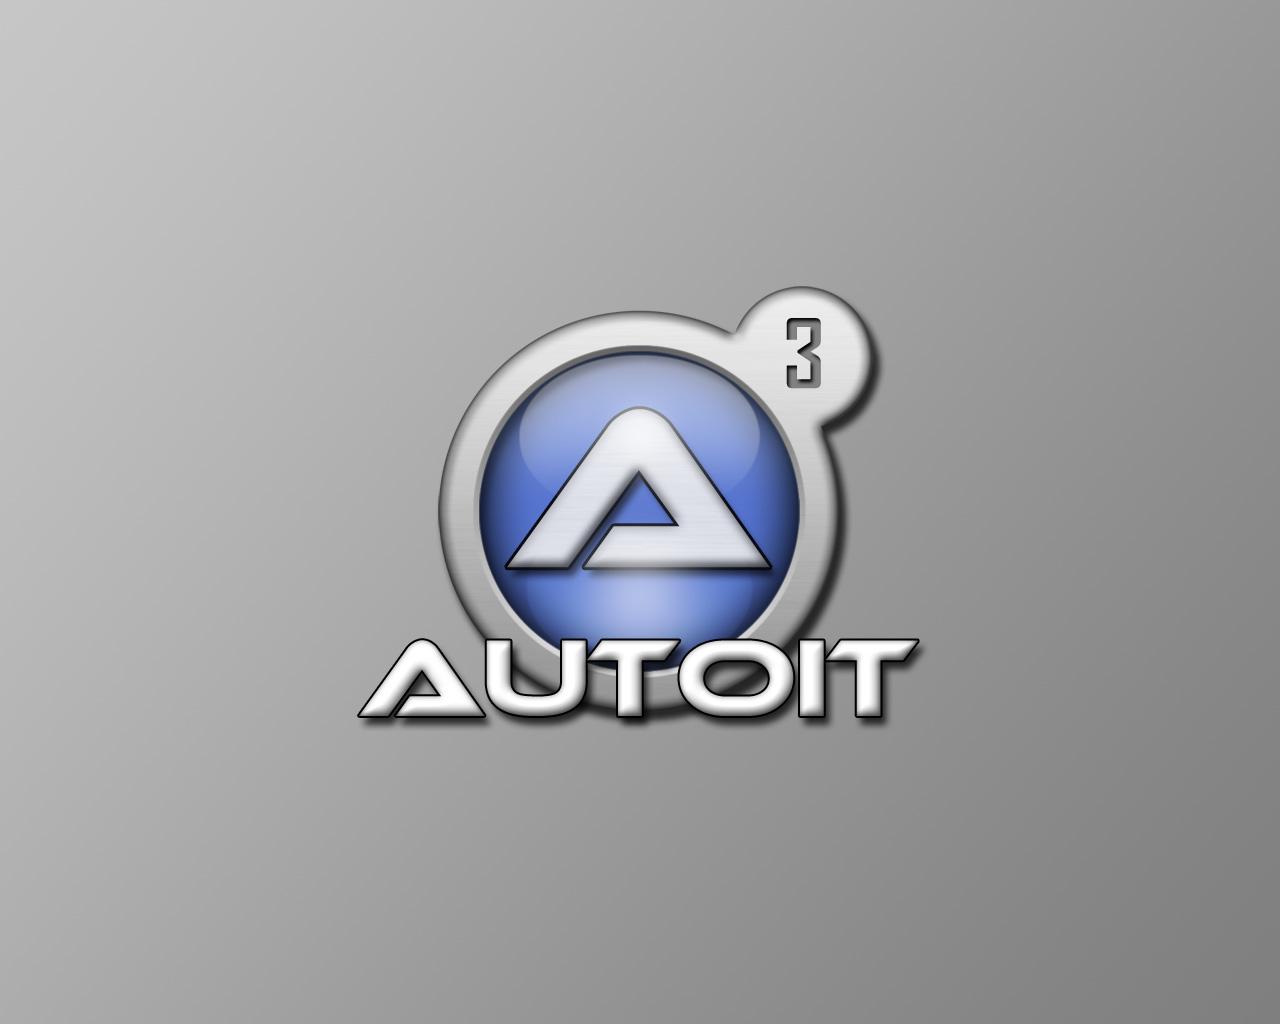 شرح حذف فيروس autoit3.exe يدوياً او ببرنامج